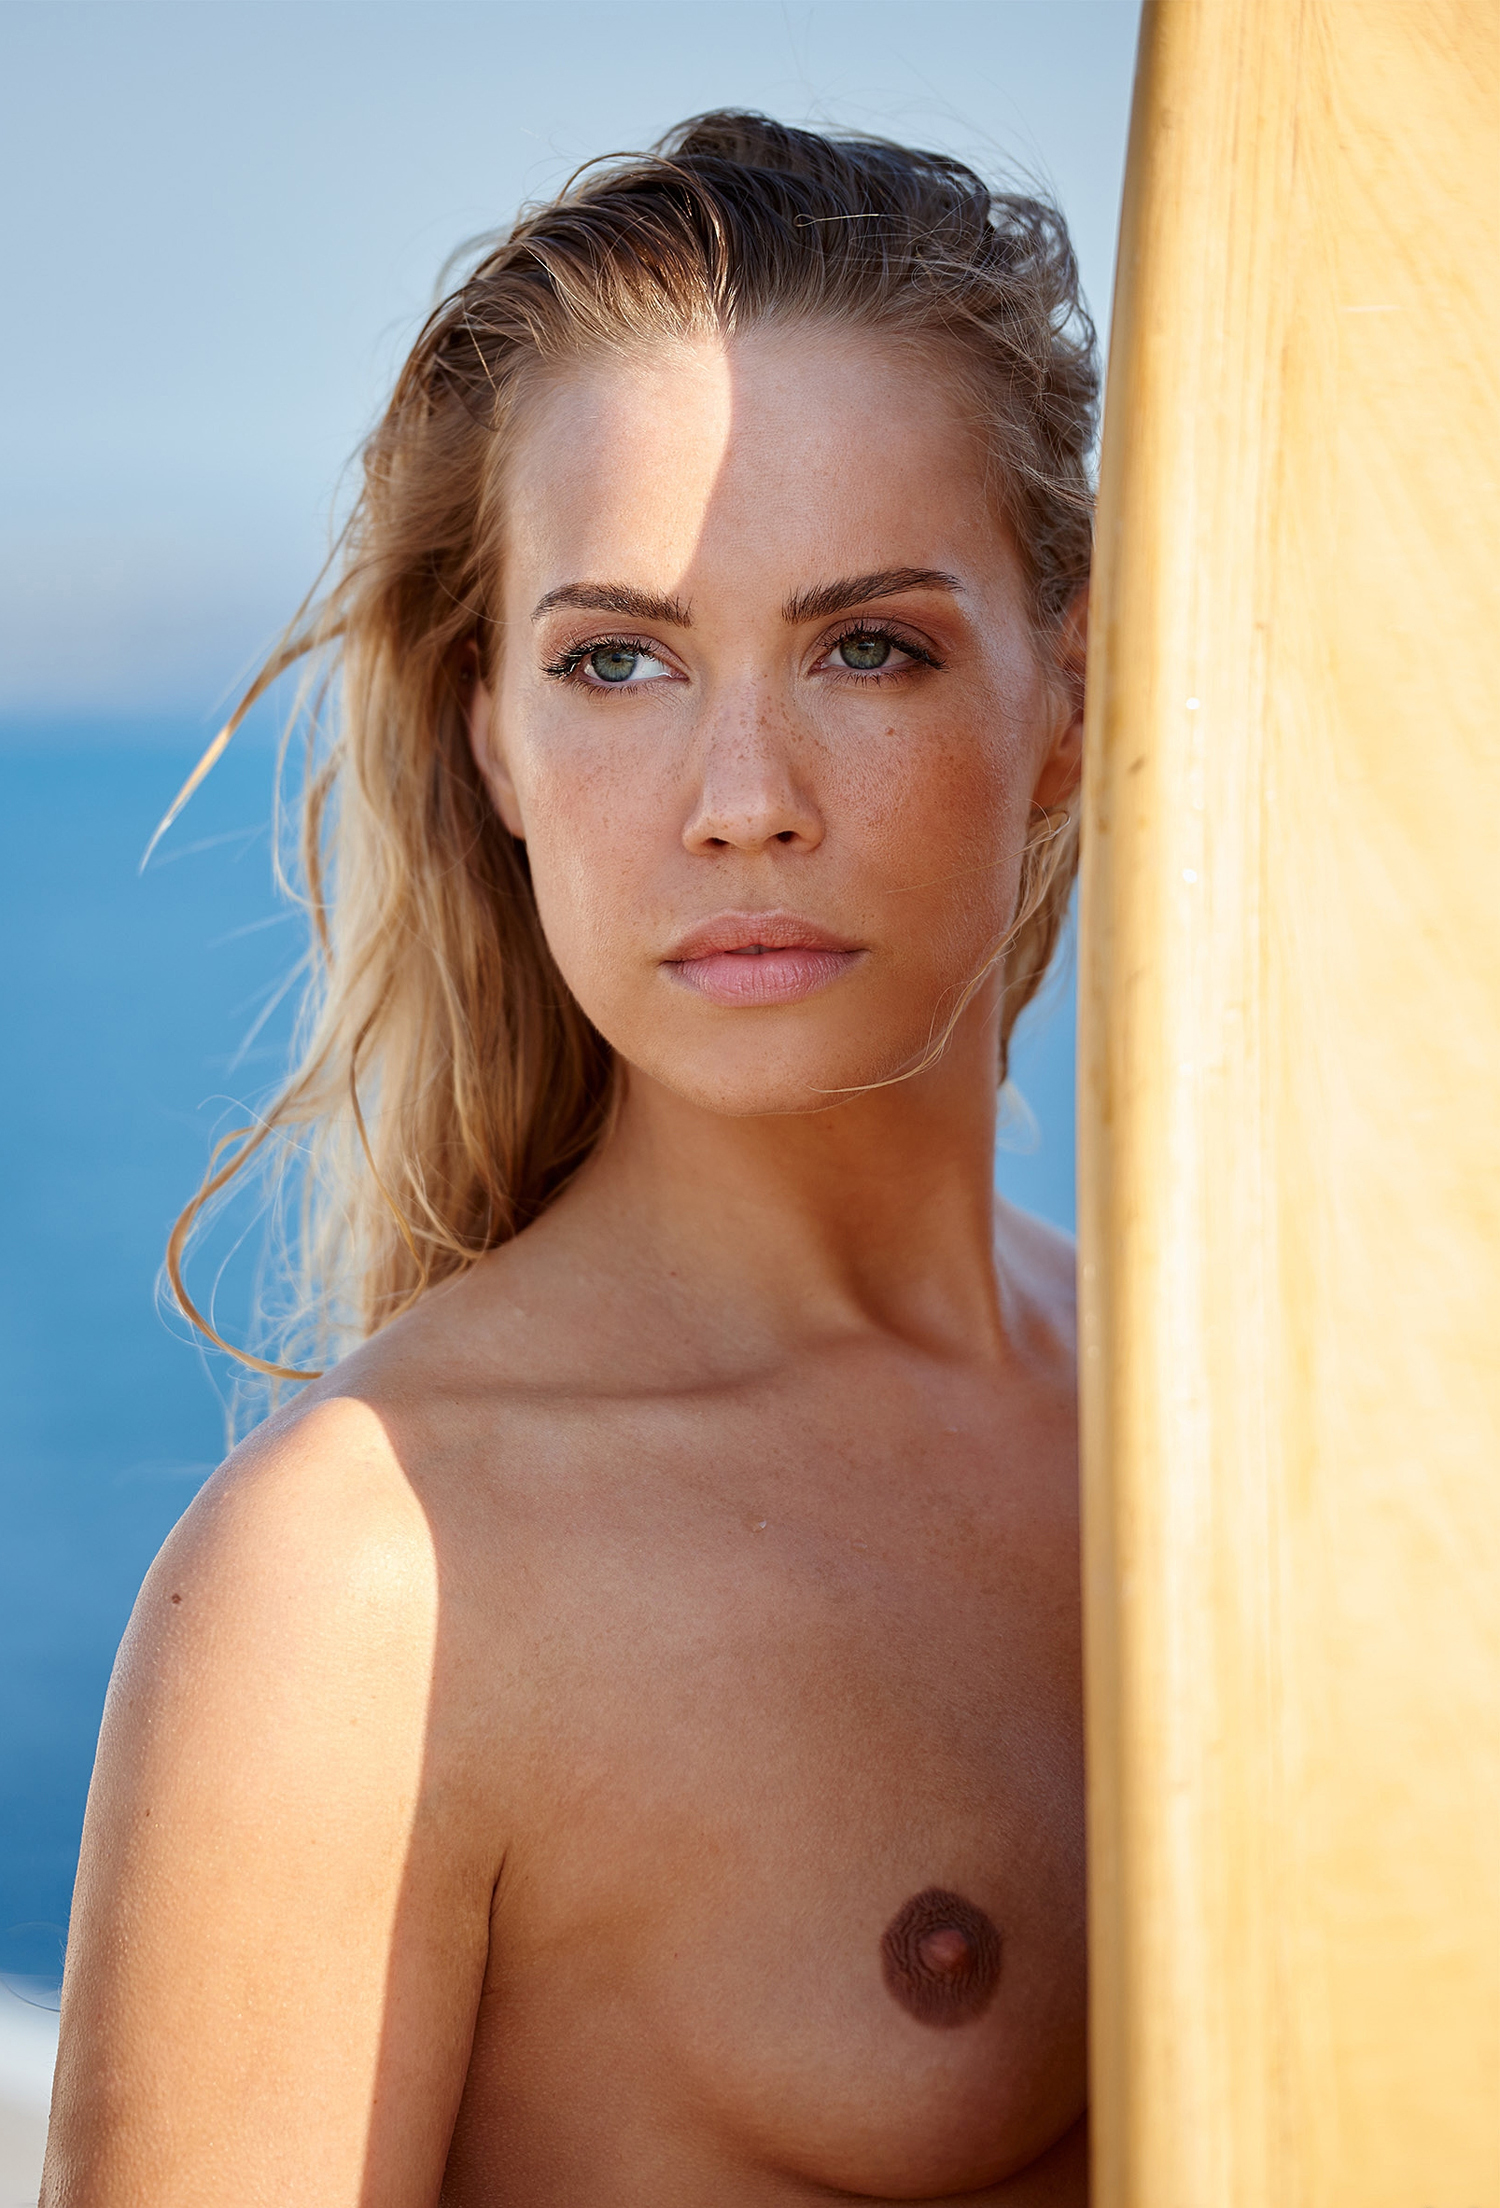 Лара-Изабель Рентинк голая. Фото - 42